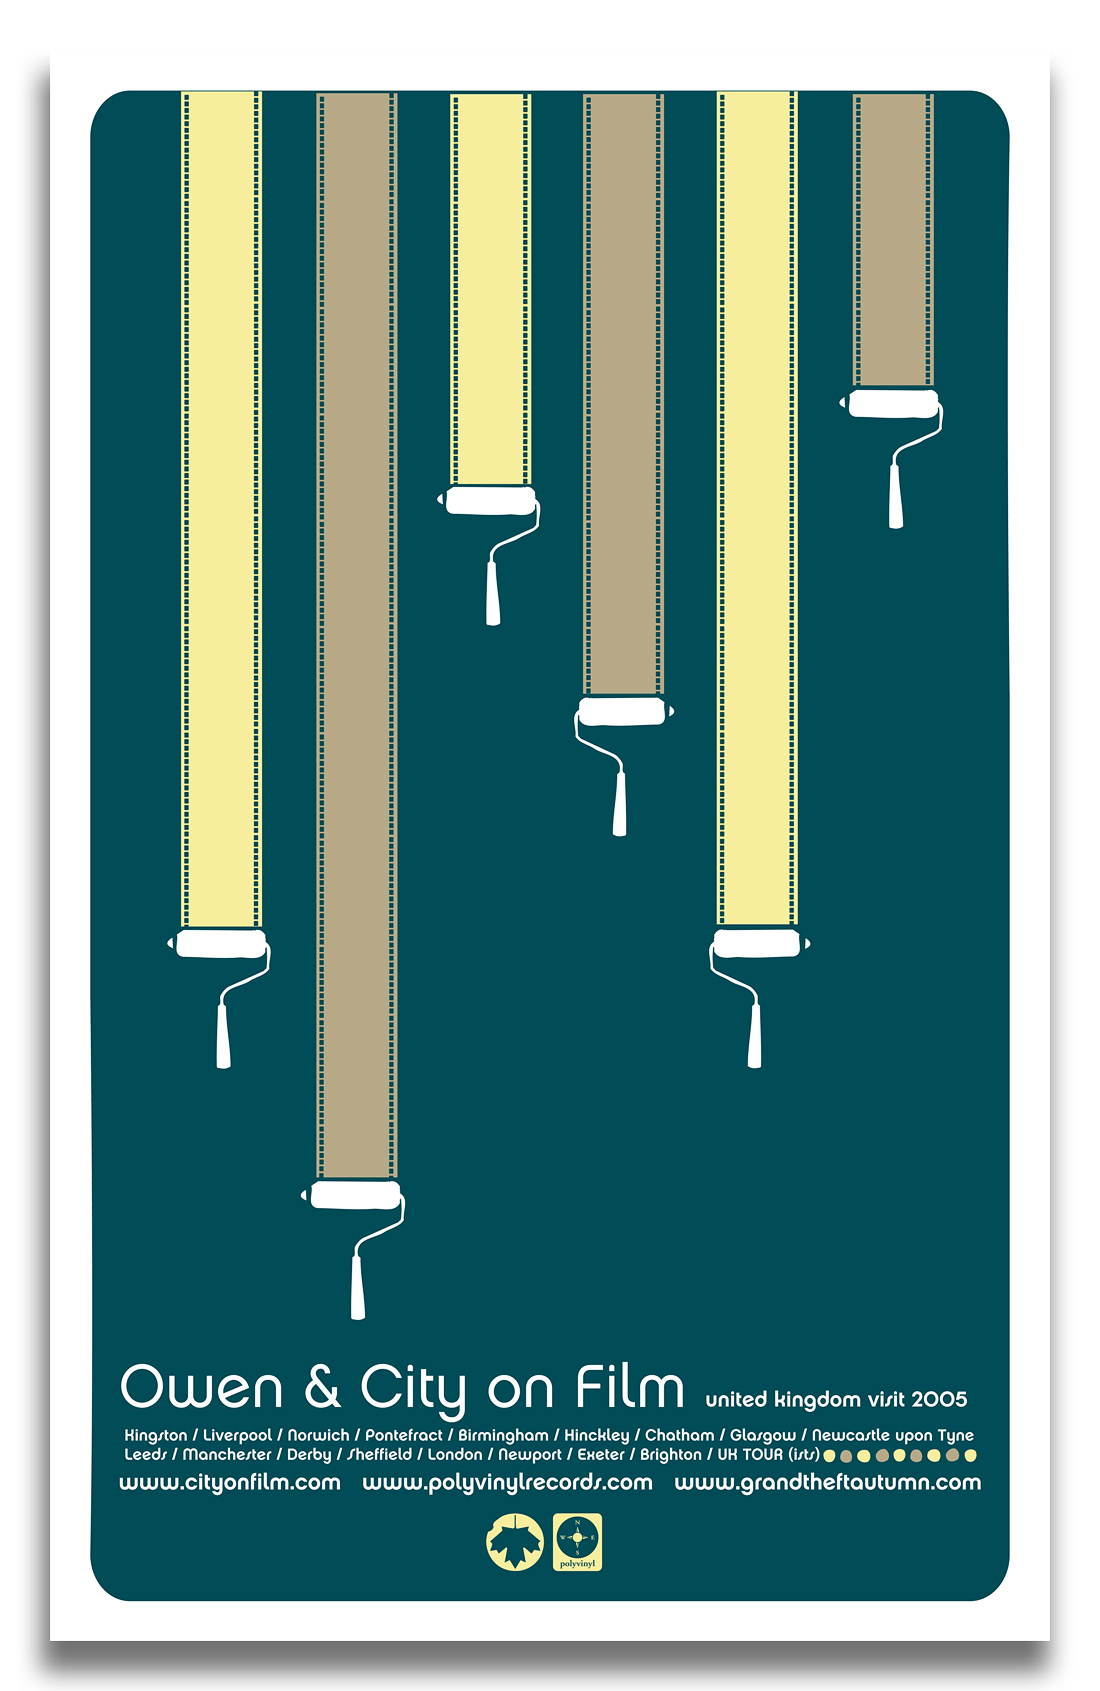 Owen & City On Film